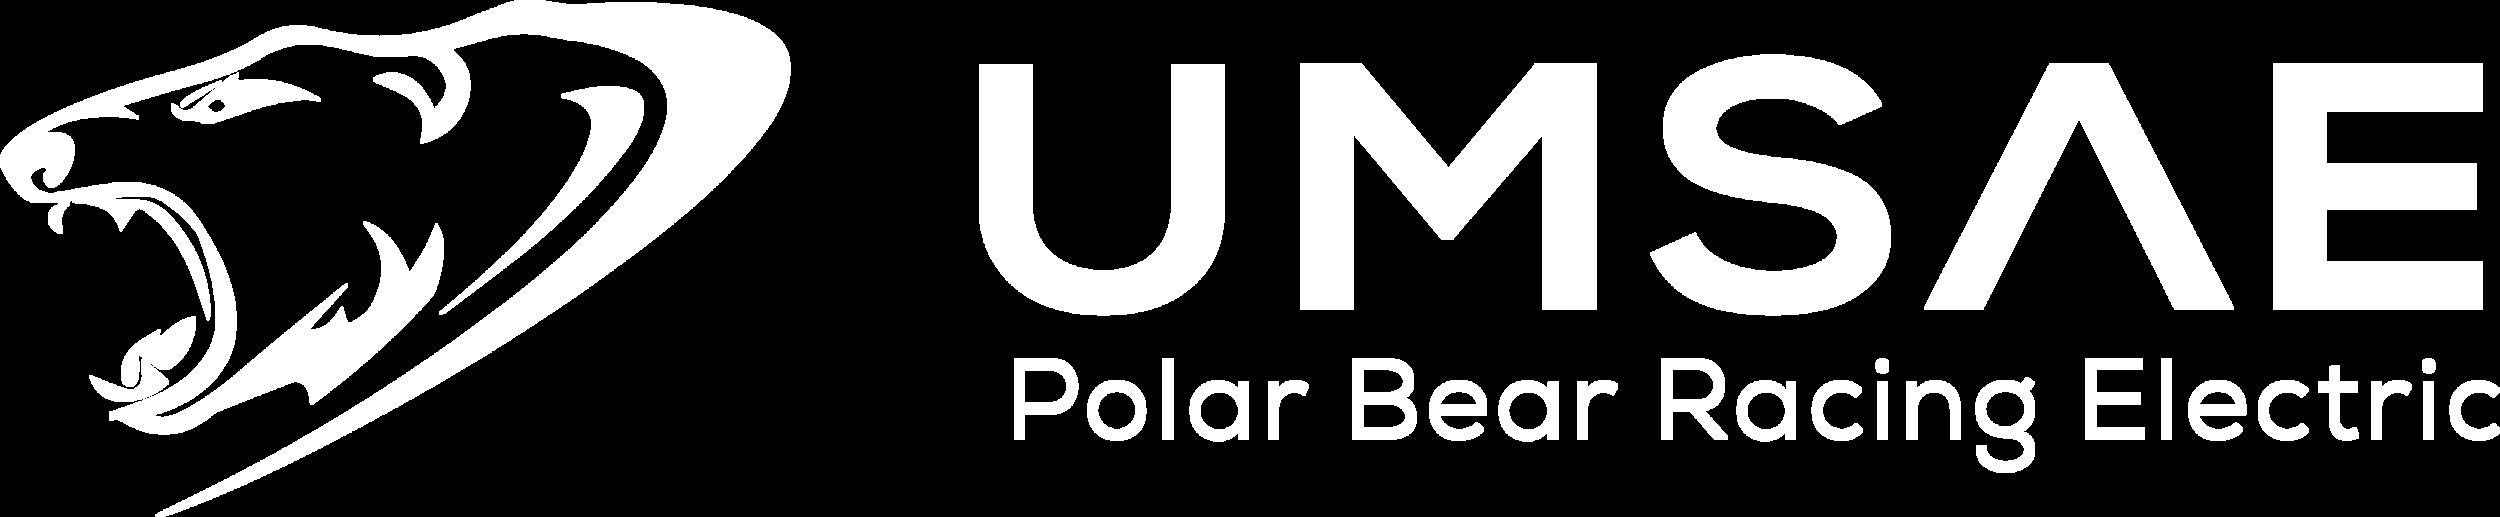 UMSAE PBRe White.png